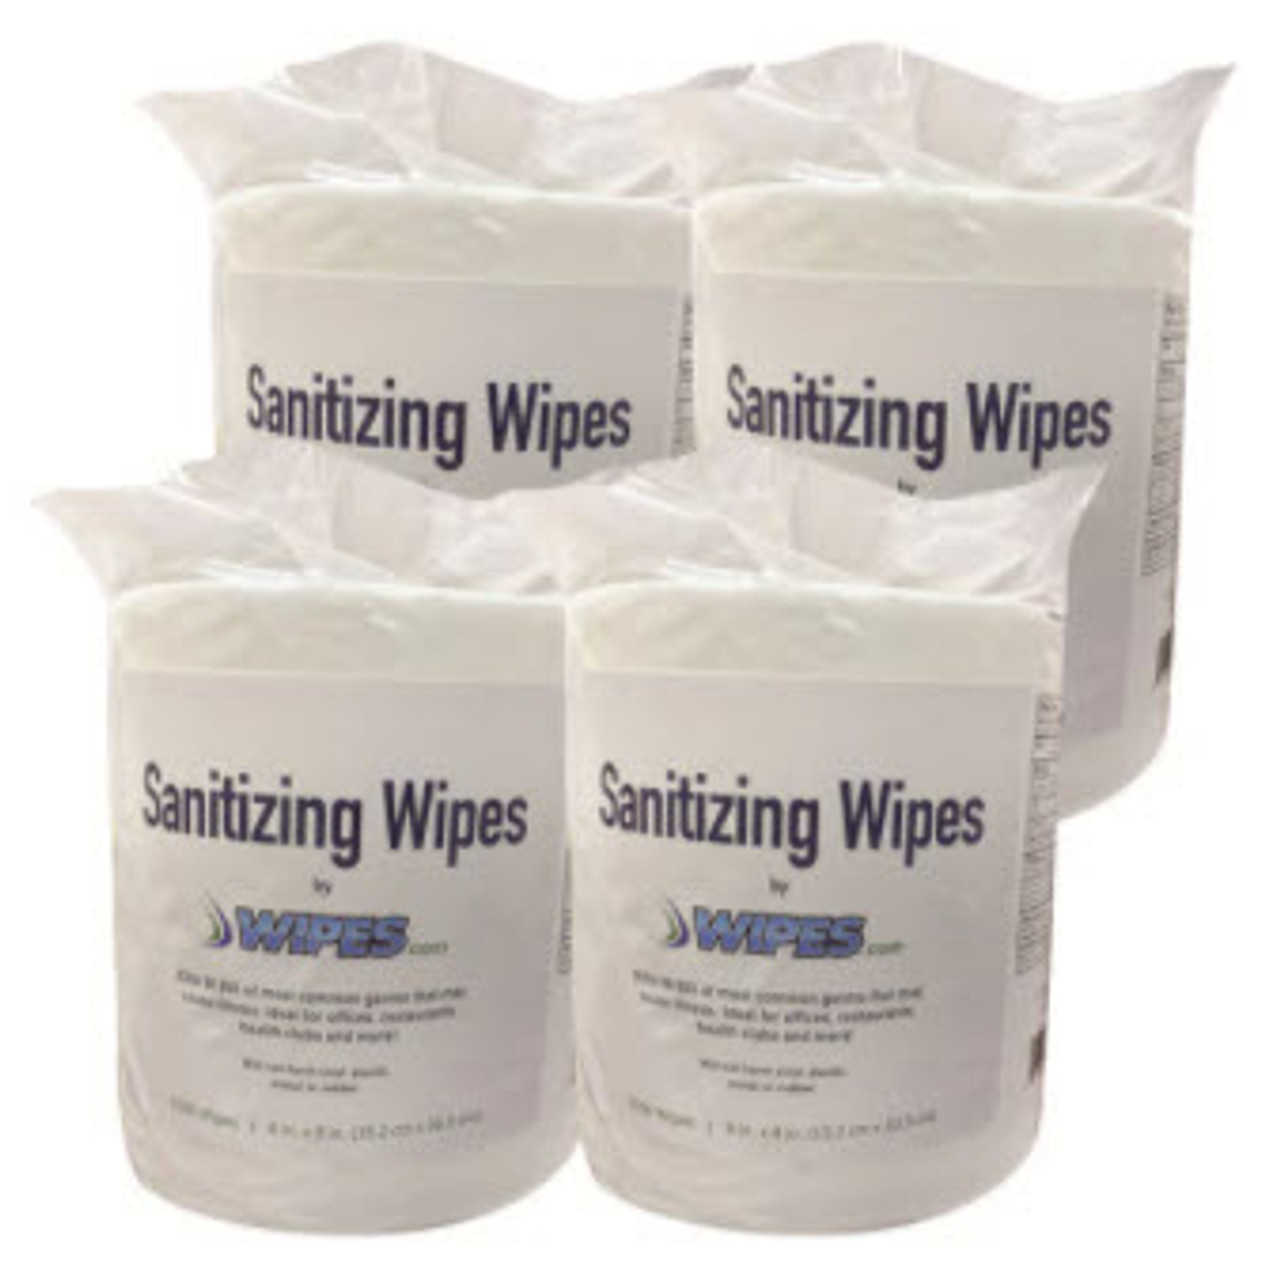 Wipes.com Sanitizing Wipes - 10 Cases